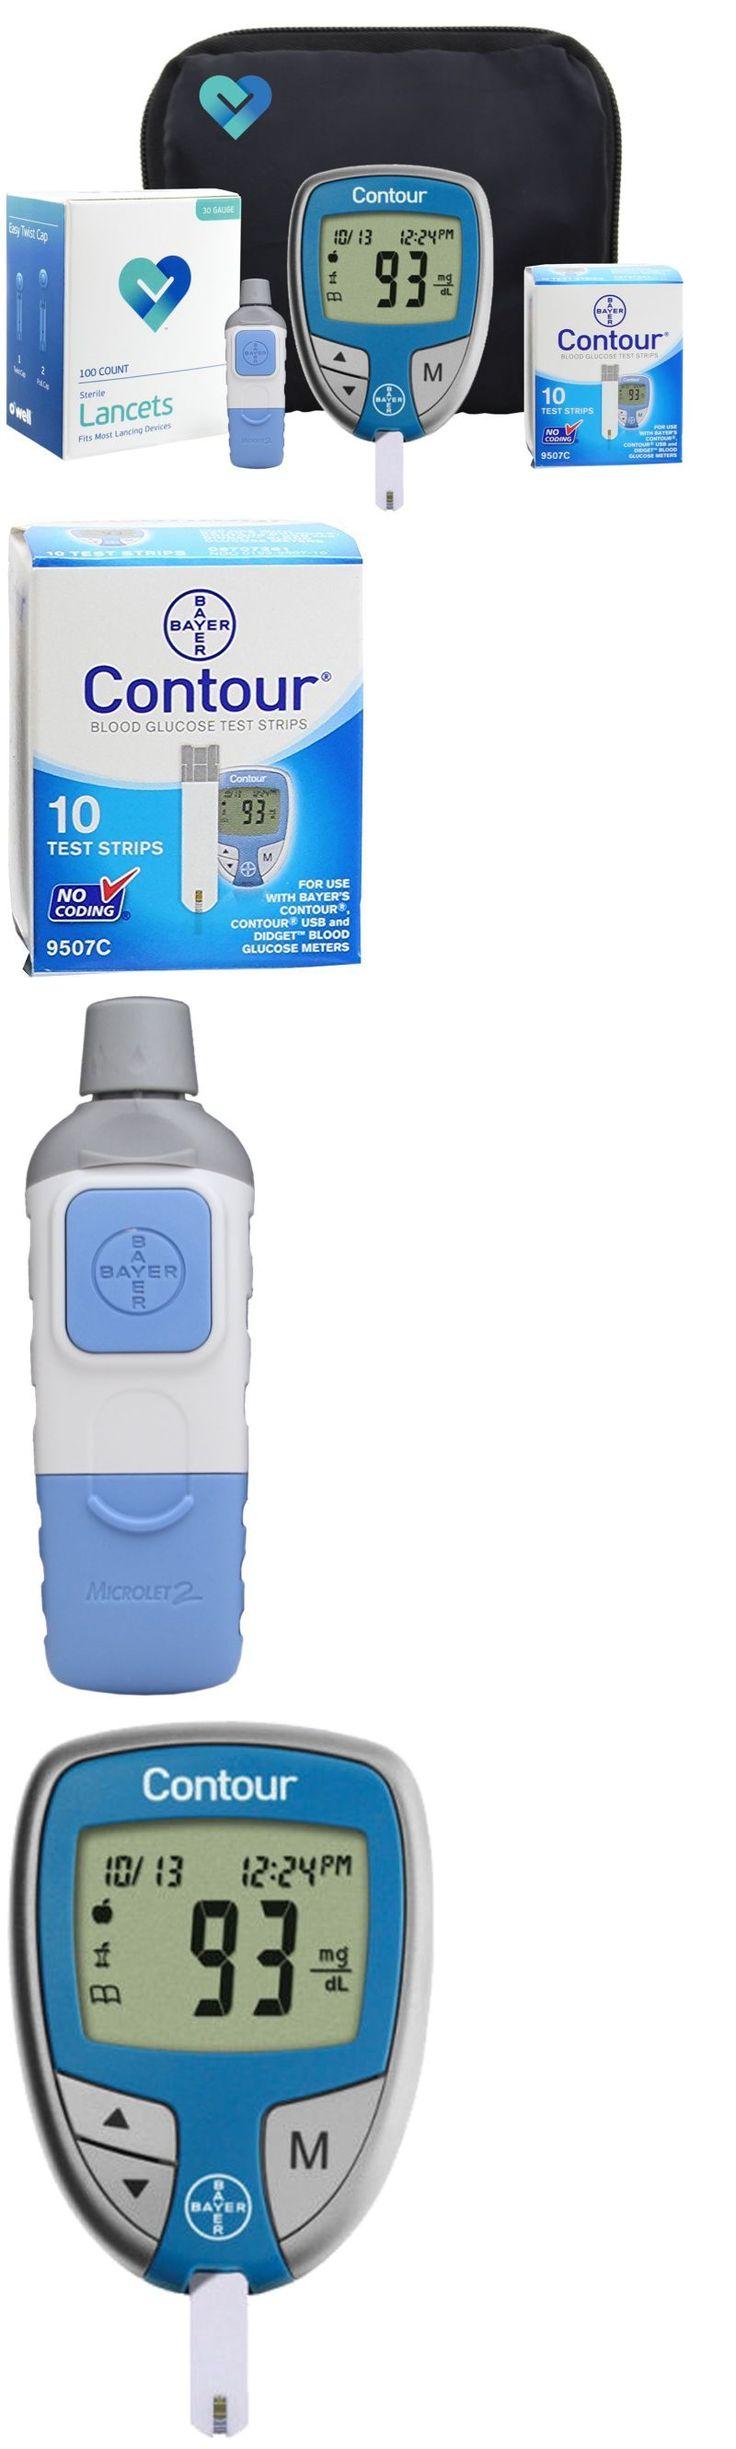 Monitoring Kits: Diabetes Test Kit Tester Diabetic Test Strips Blood Sugar Glucose Meter Machine -> BUY IT NOW ONLY: $38.46 on eBay!